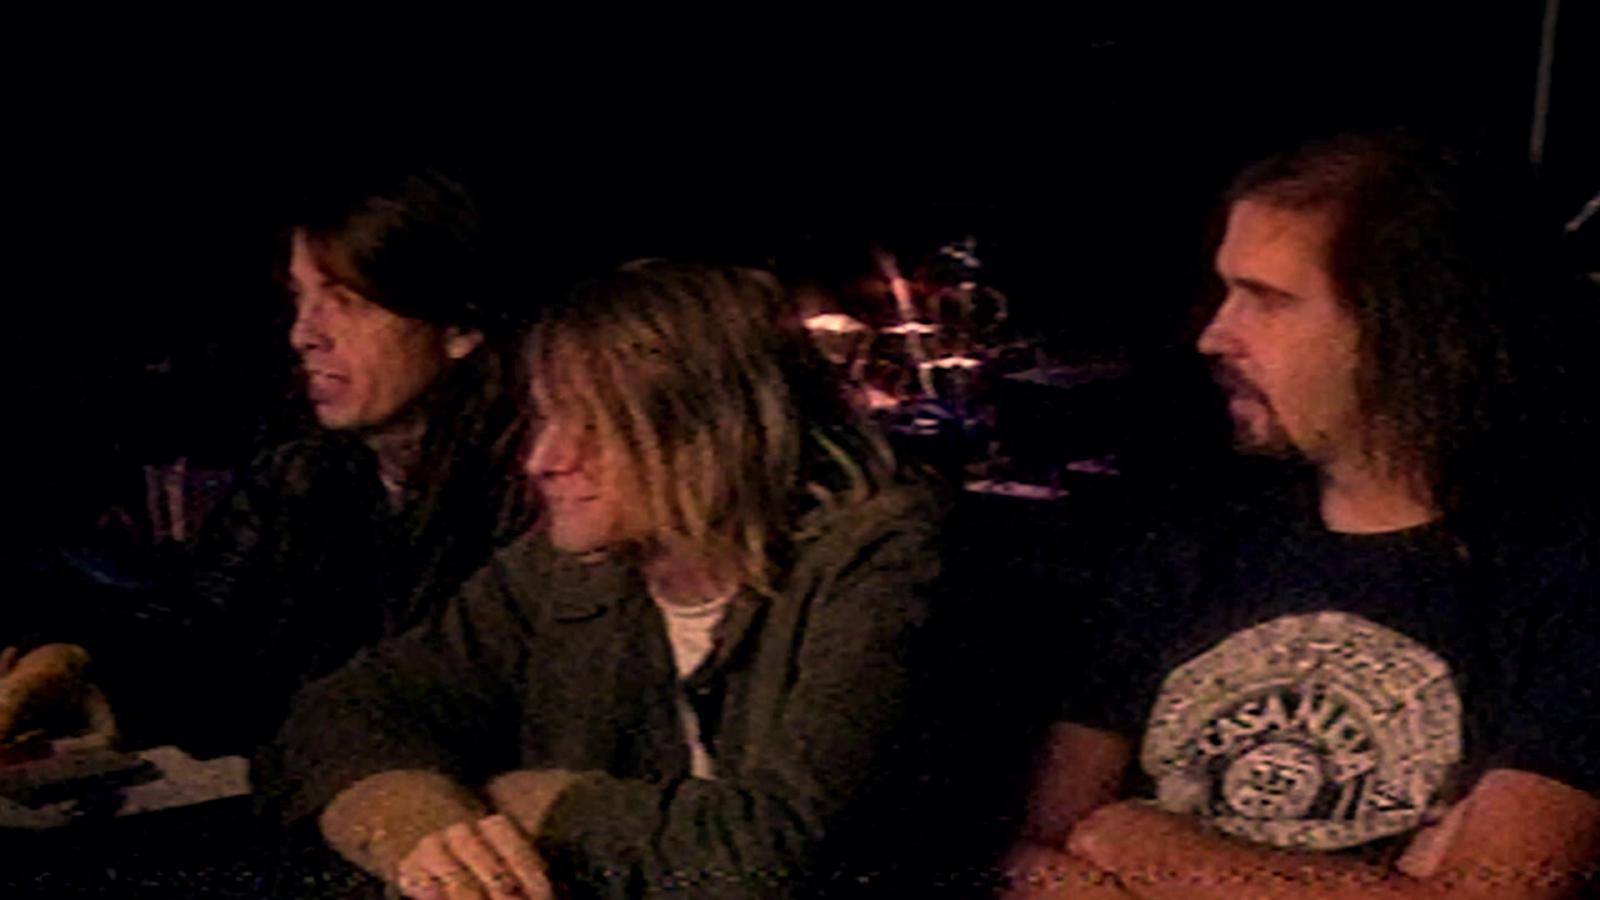 Kurt Cobain Montage Of Heck (2015) 1080p BD25 3